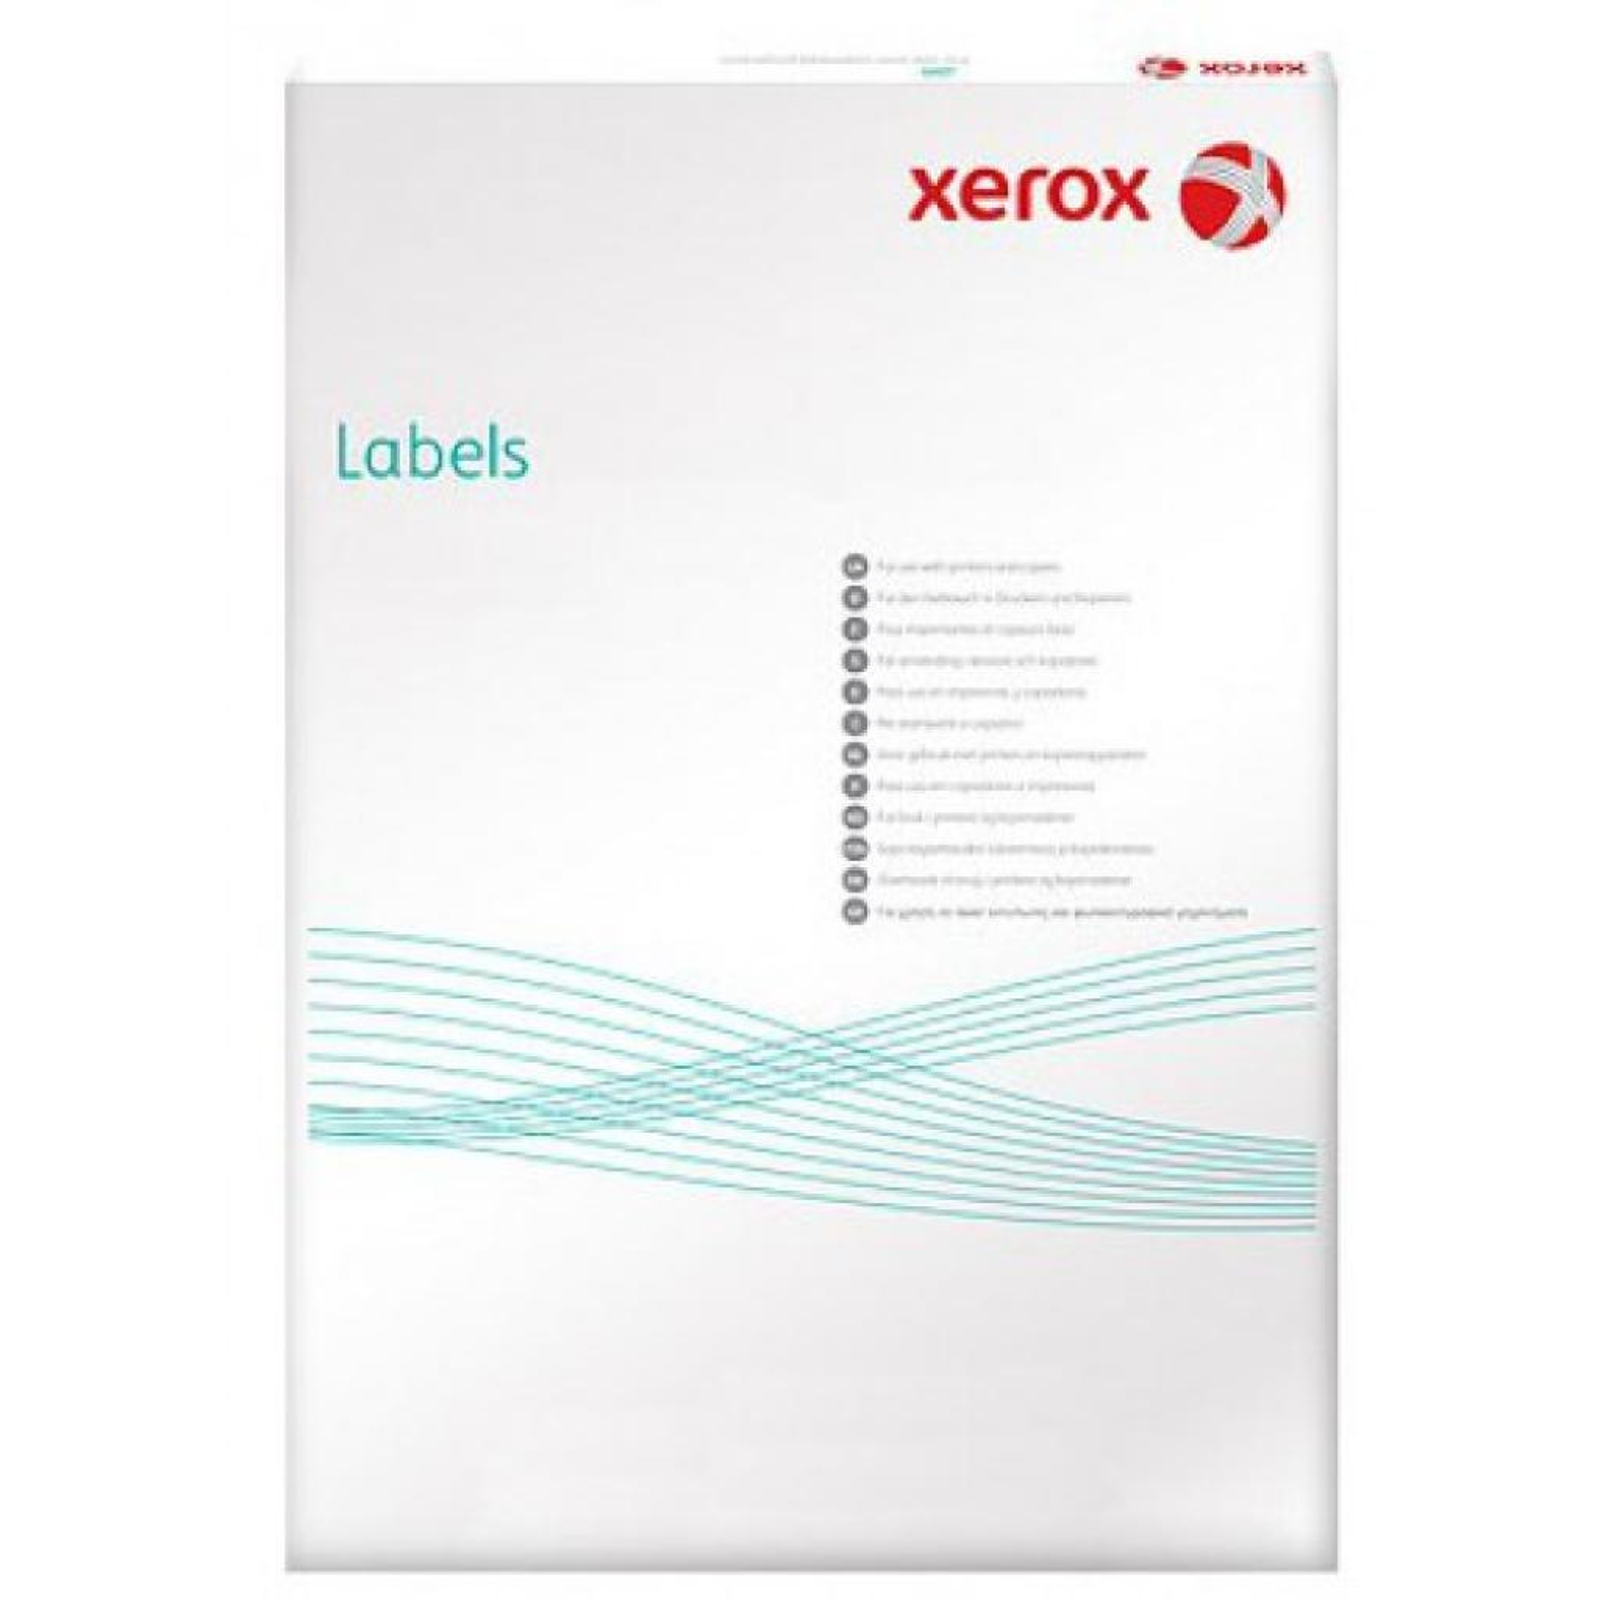 Етикетка самоклеюча XEROX 003R97411